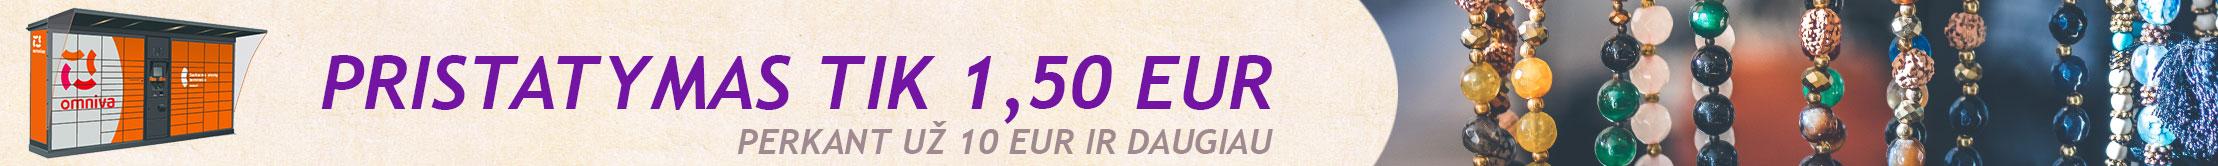 Omniva-pristaymas-tik-1-50-Eur-www-saromania-lt-2